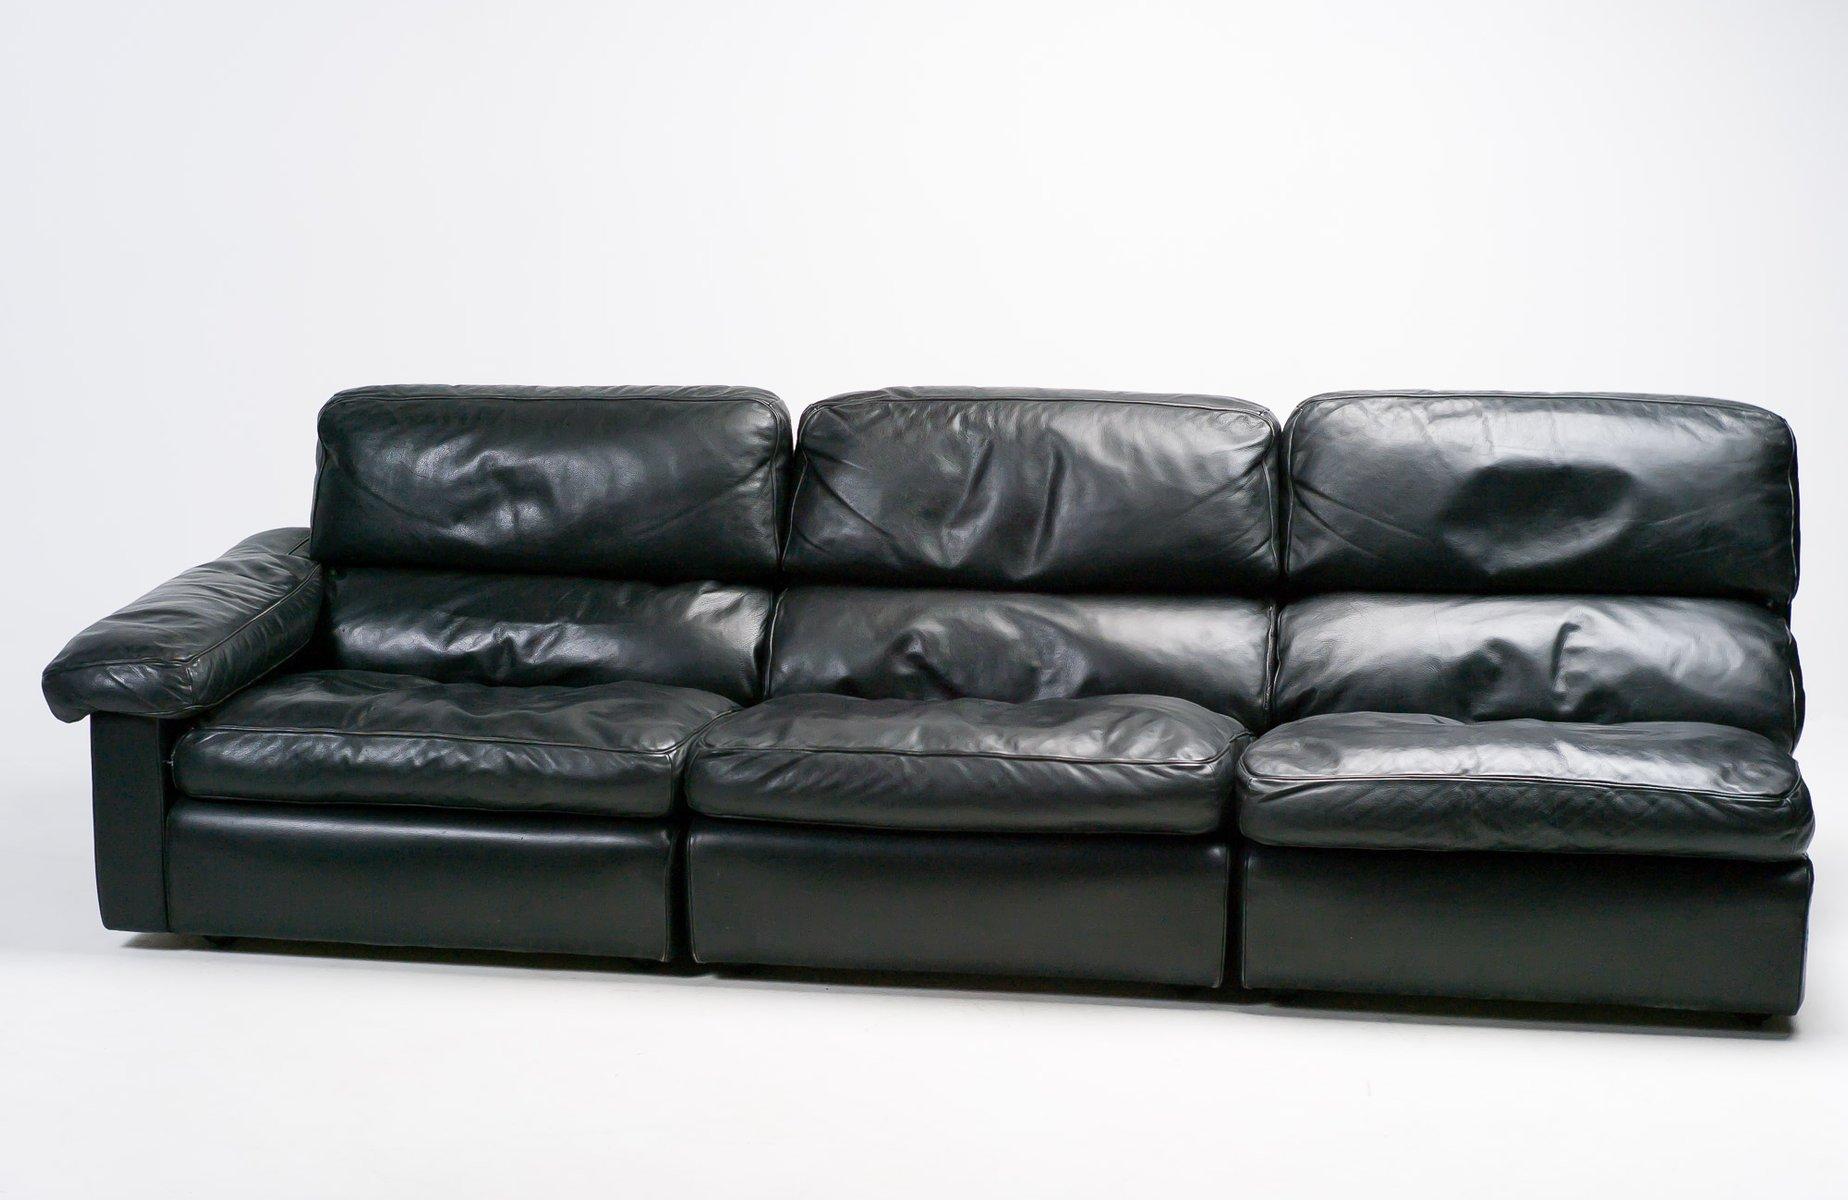 Italian Sectional Sofa By Tito Agnoli For Poltrona Frau, 1970s